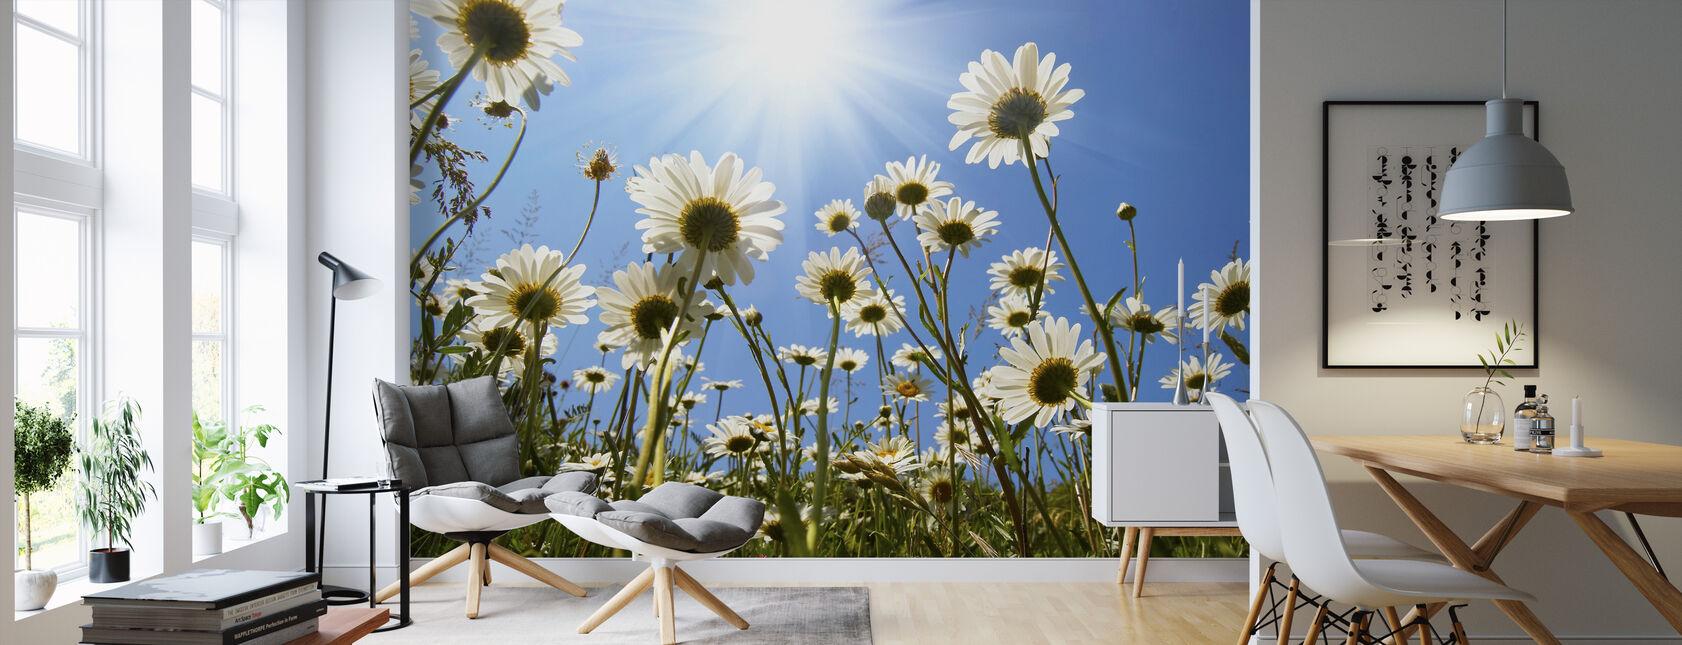 White Daisies - Wallpaper - Living Room